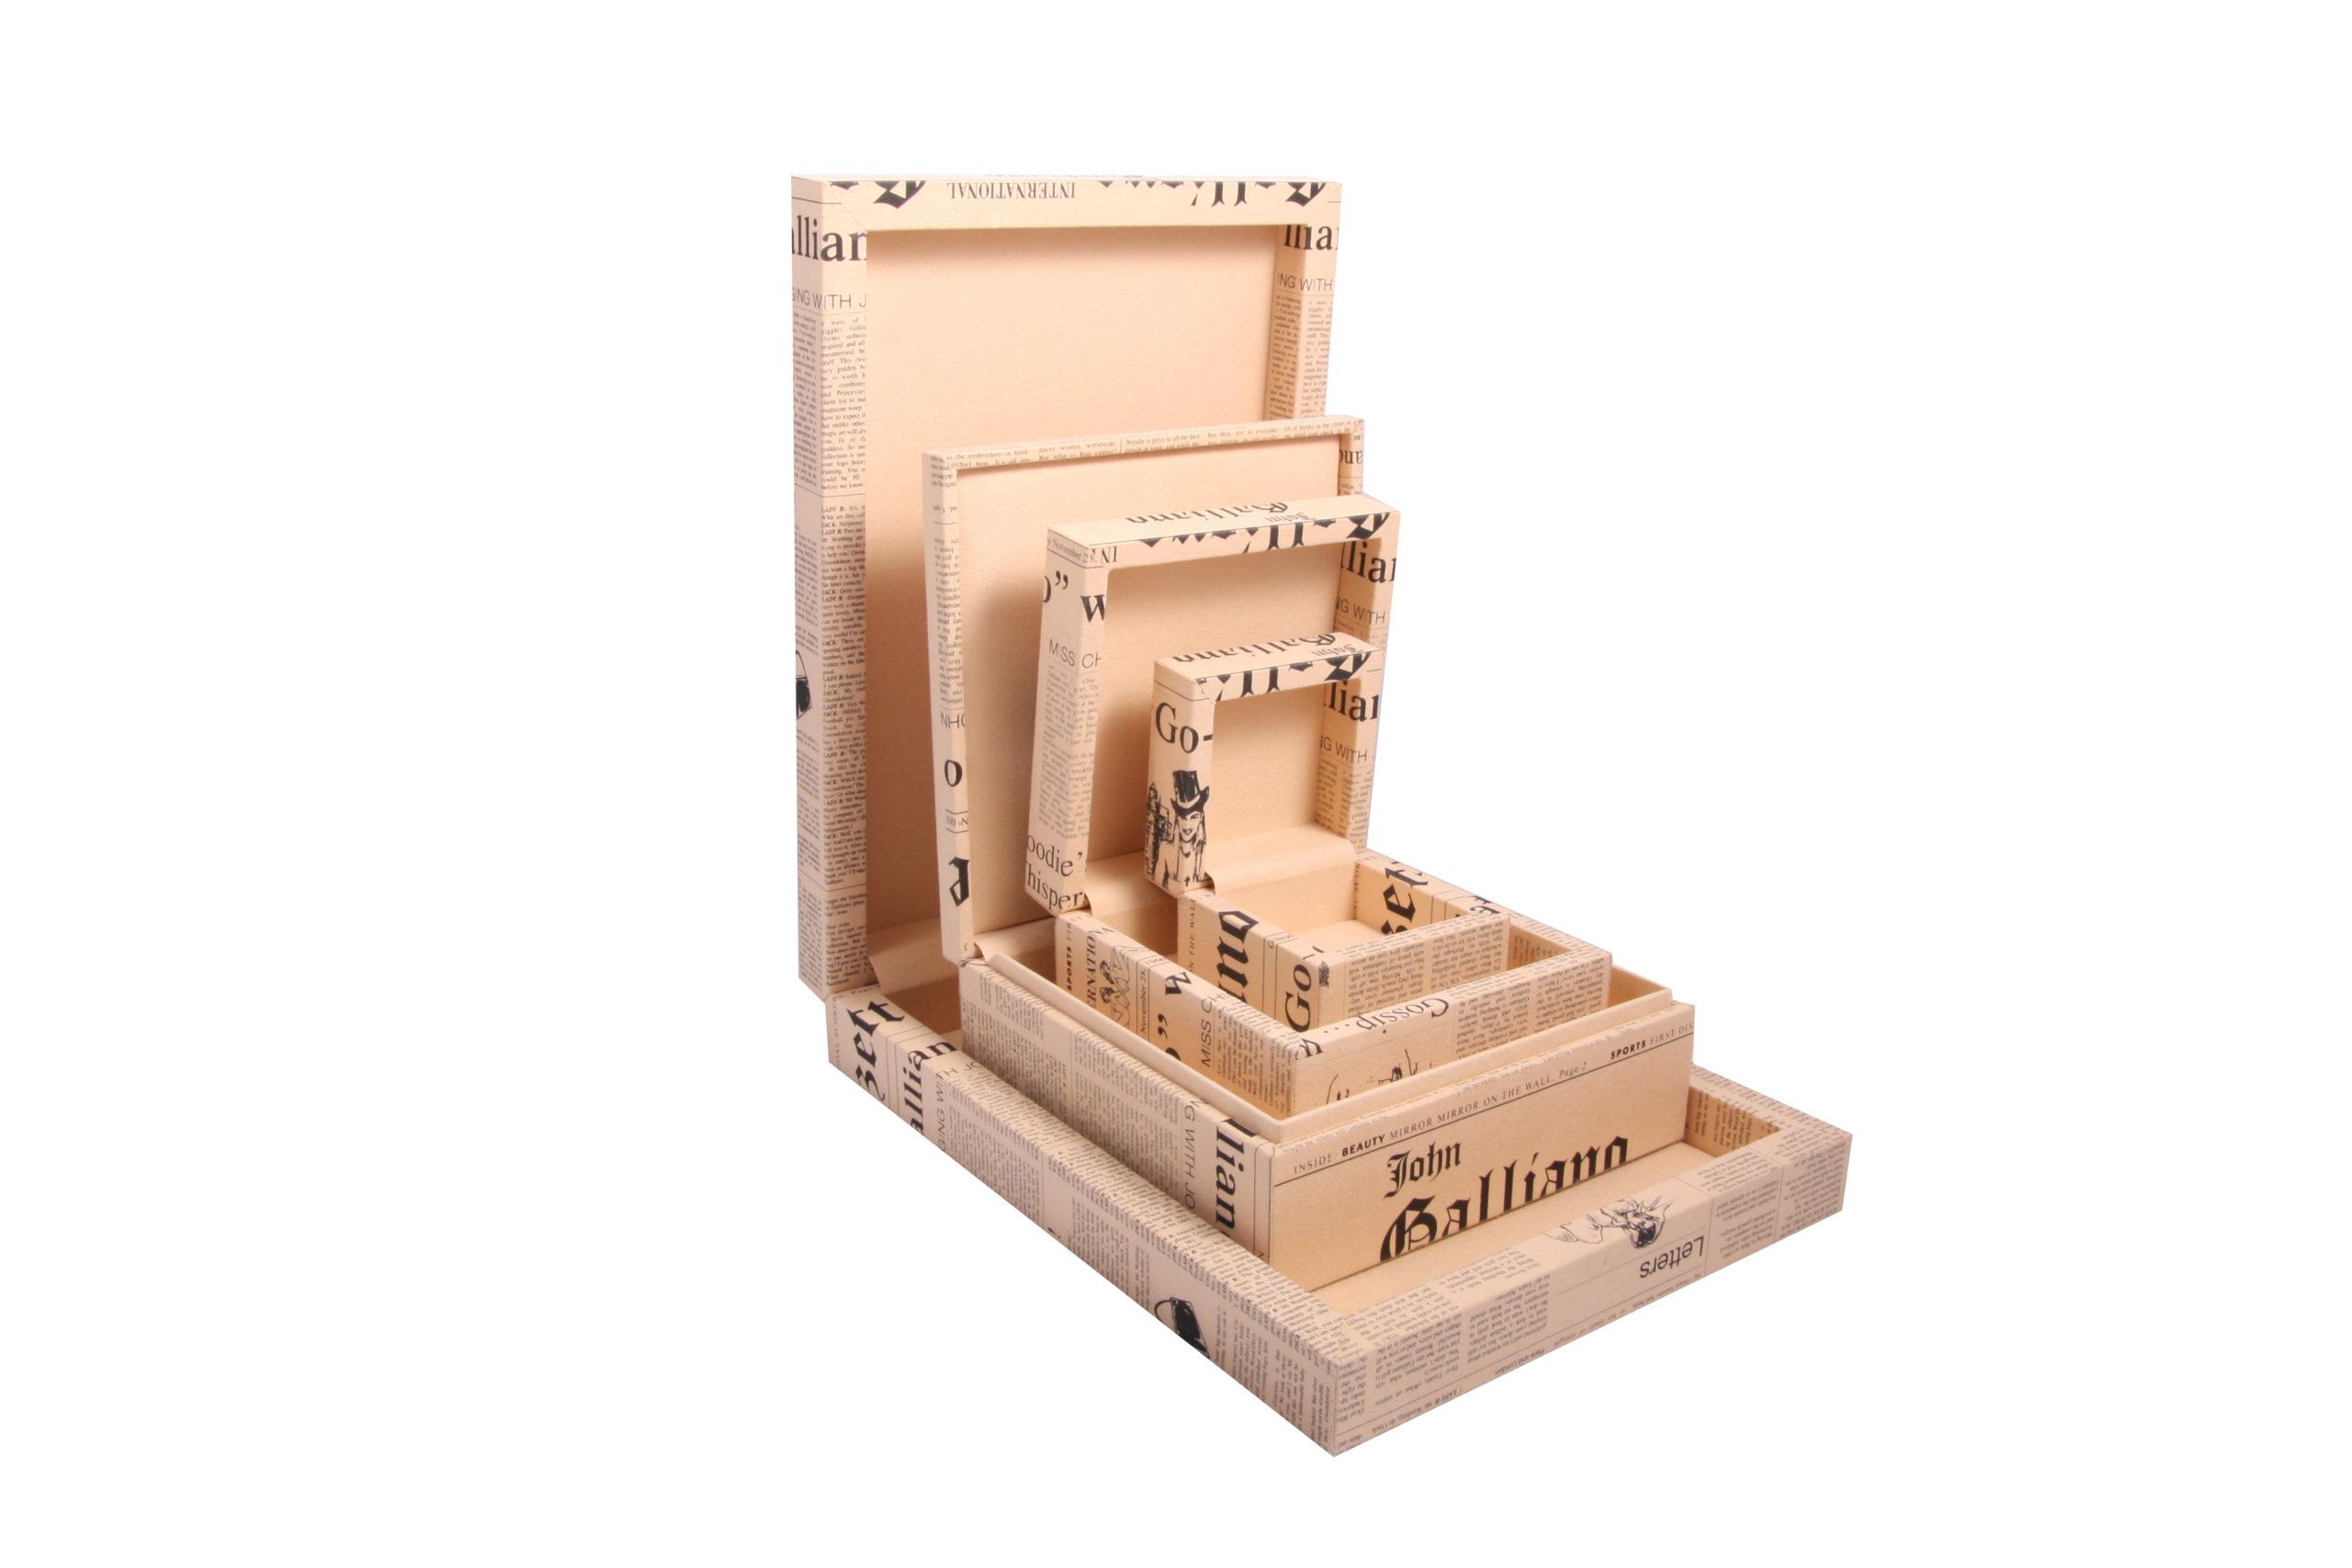 Glorybox - MDF Gift Box